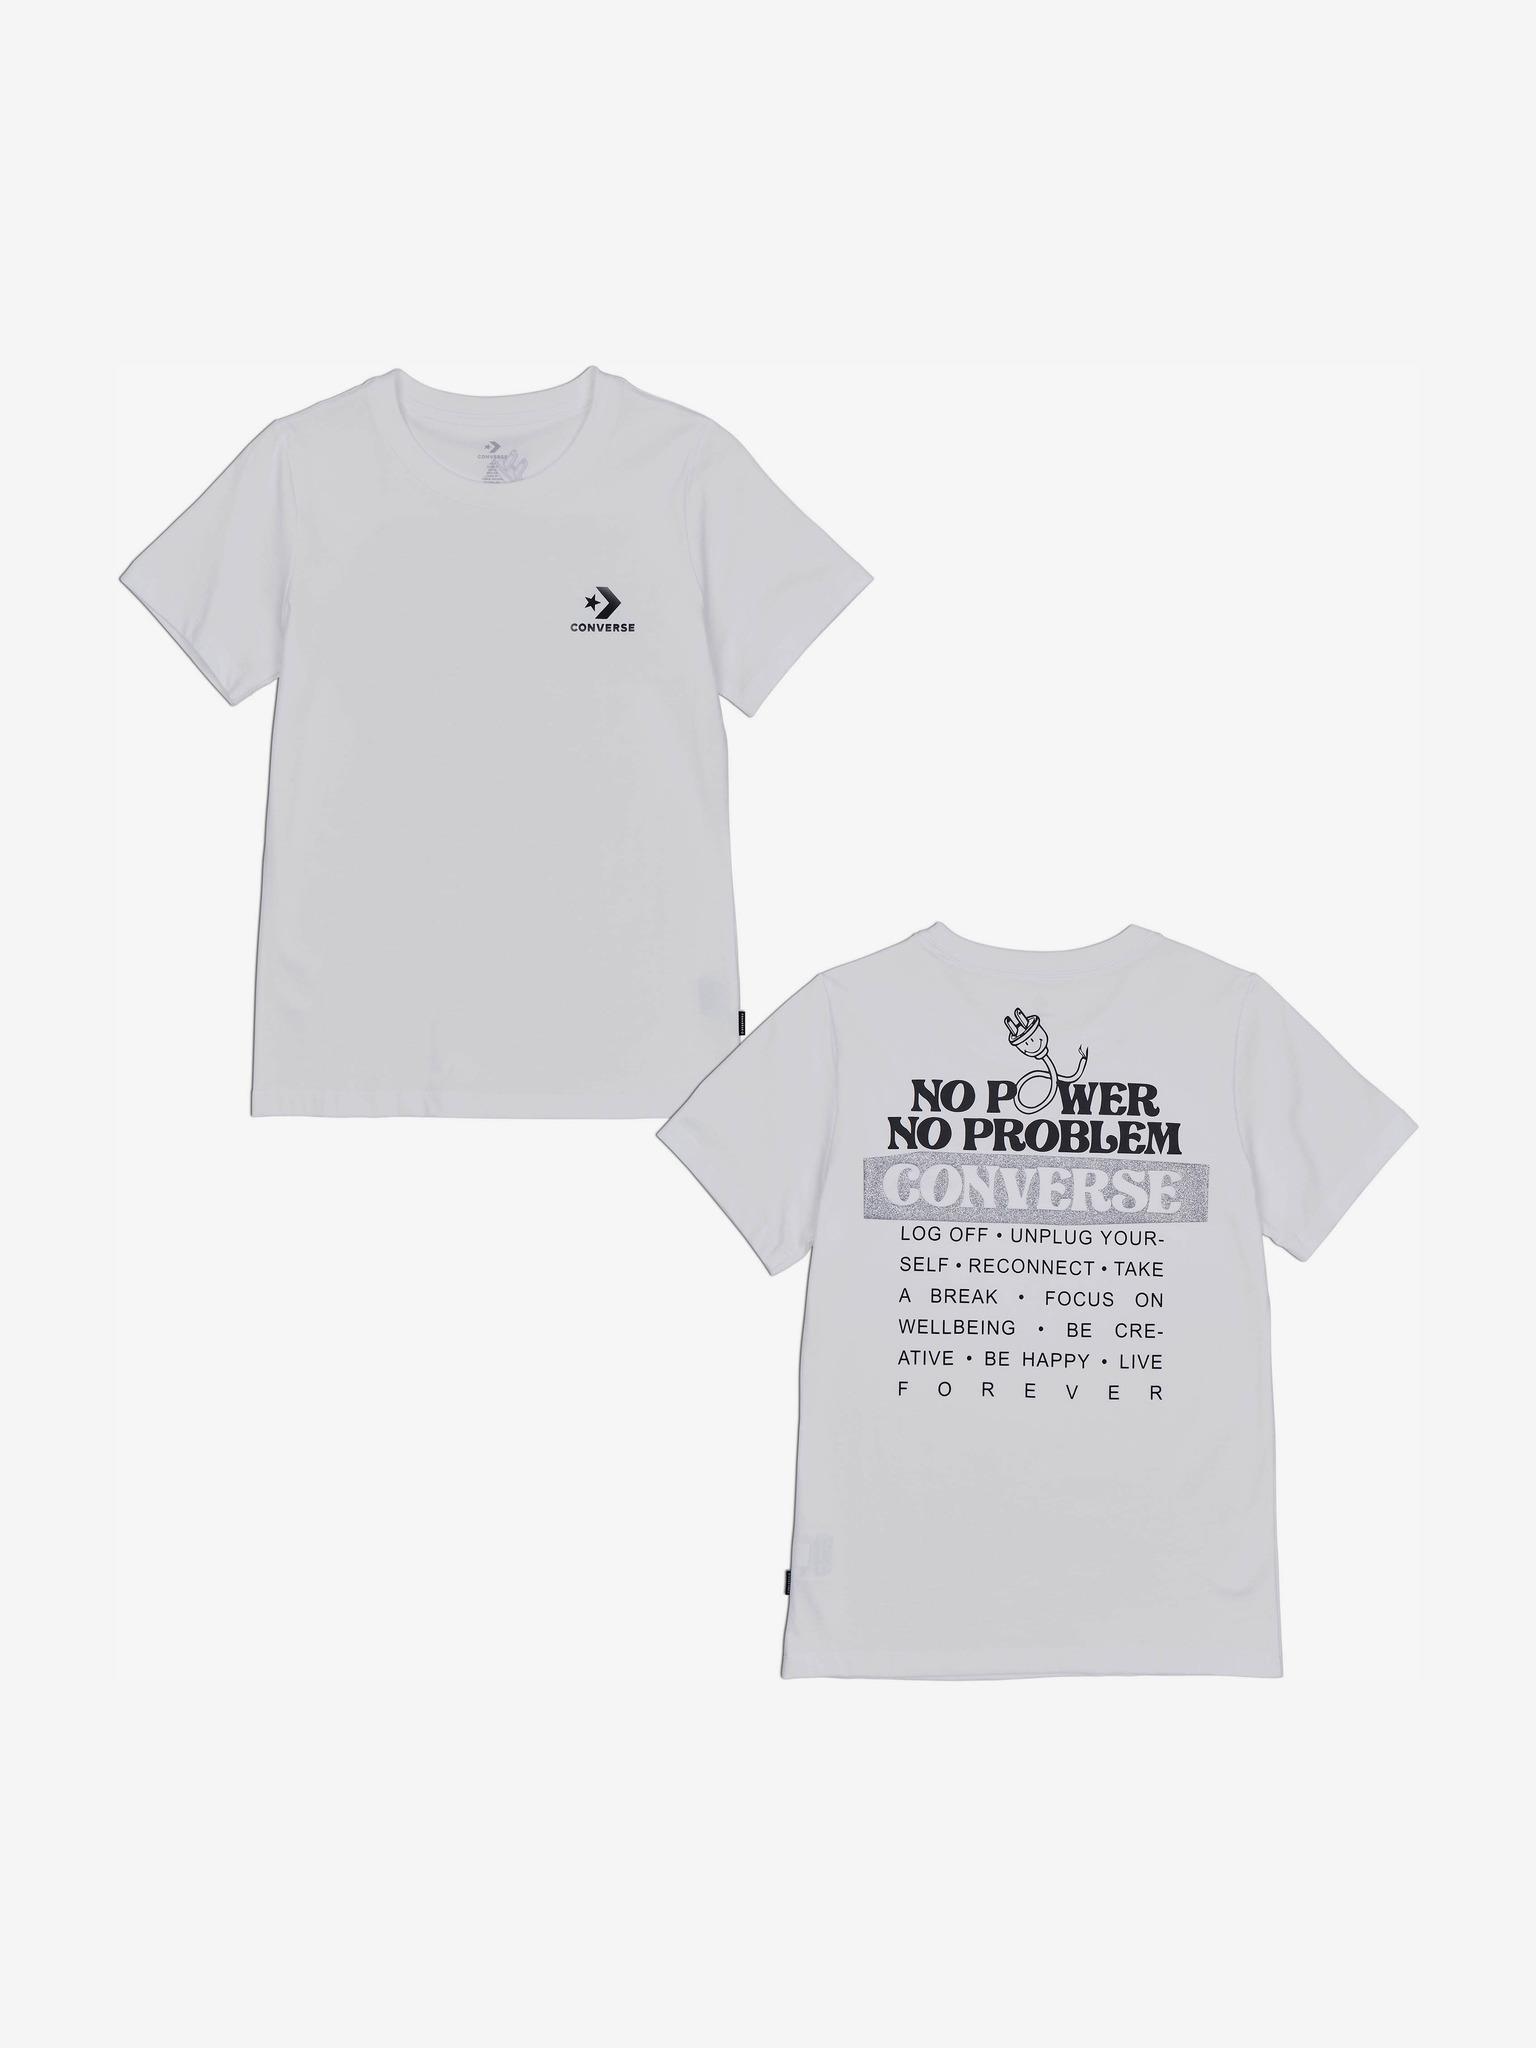 Converse Women's t-shirt white  Off